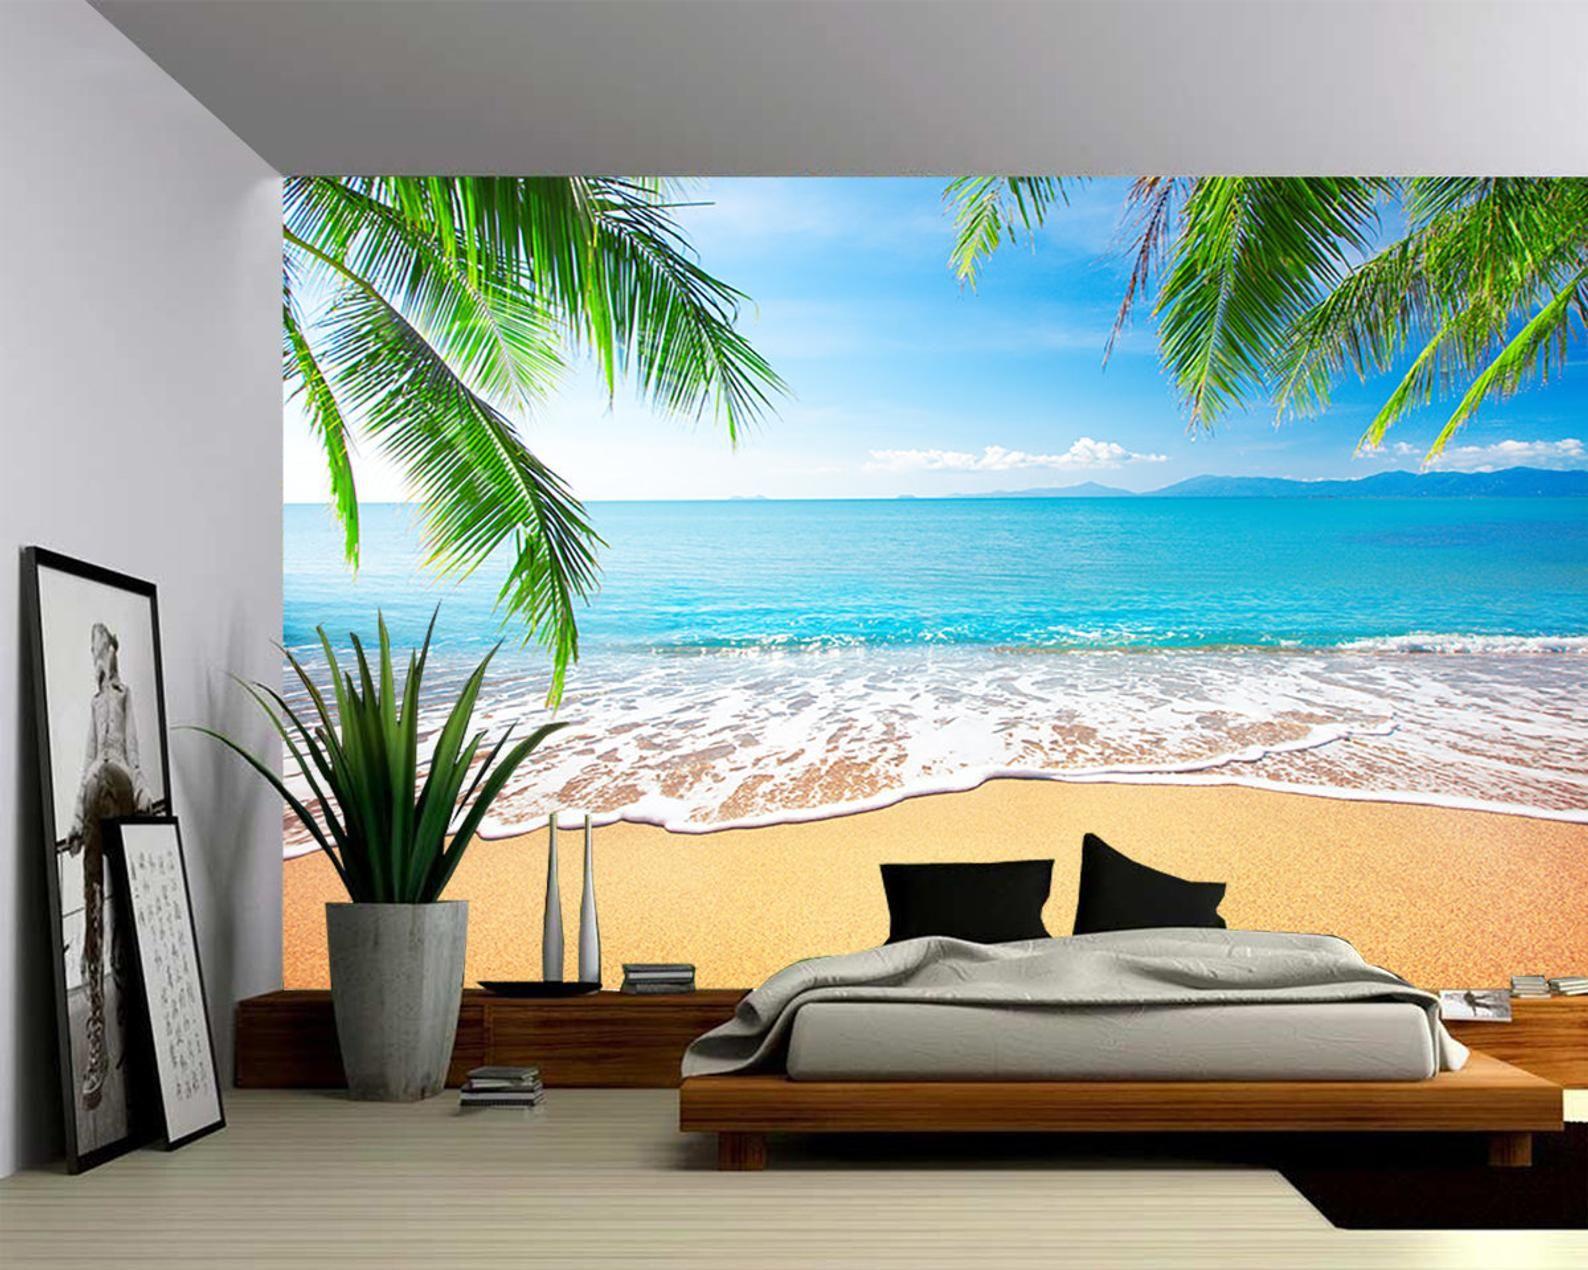 Palm and Tropical Beach Large Wall Mural, Selfadhesive